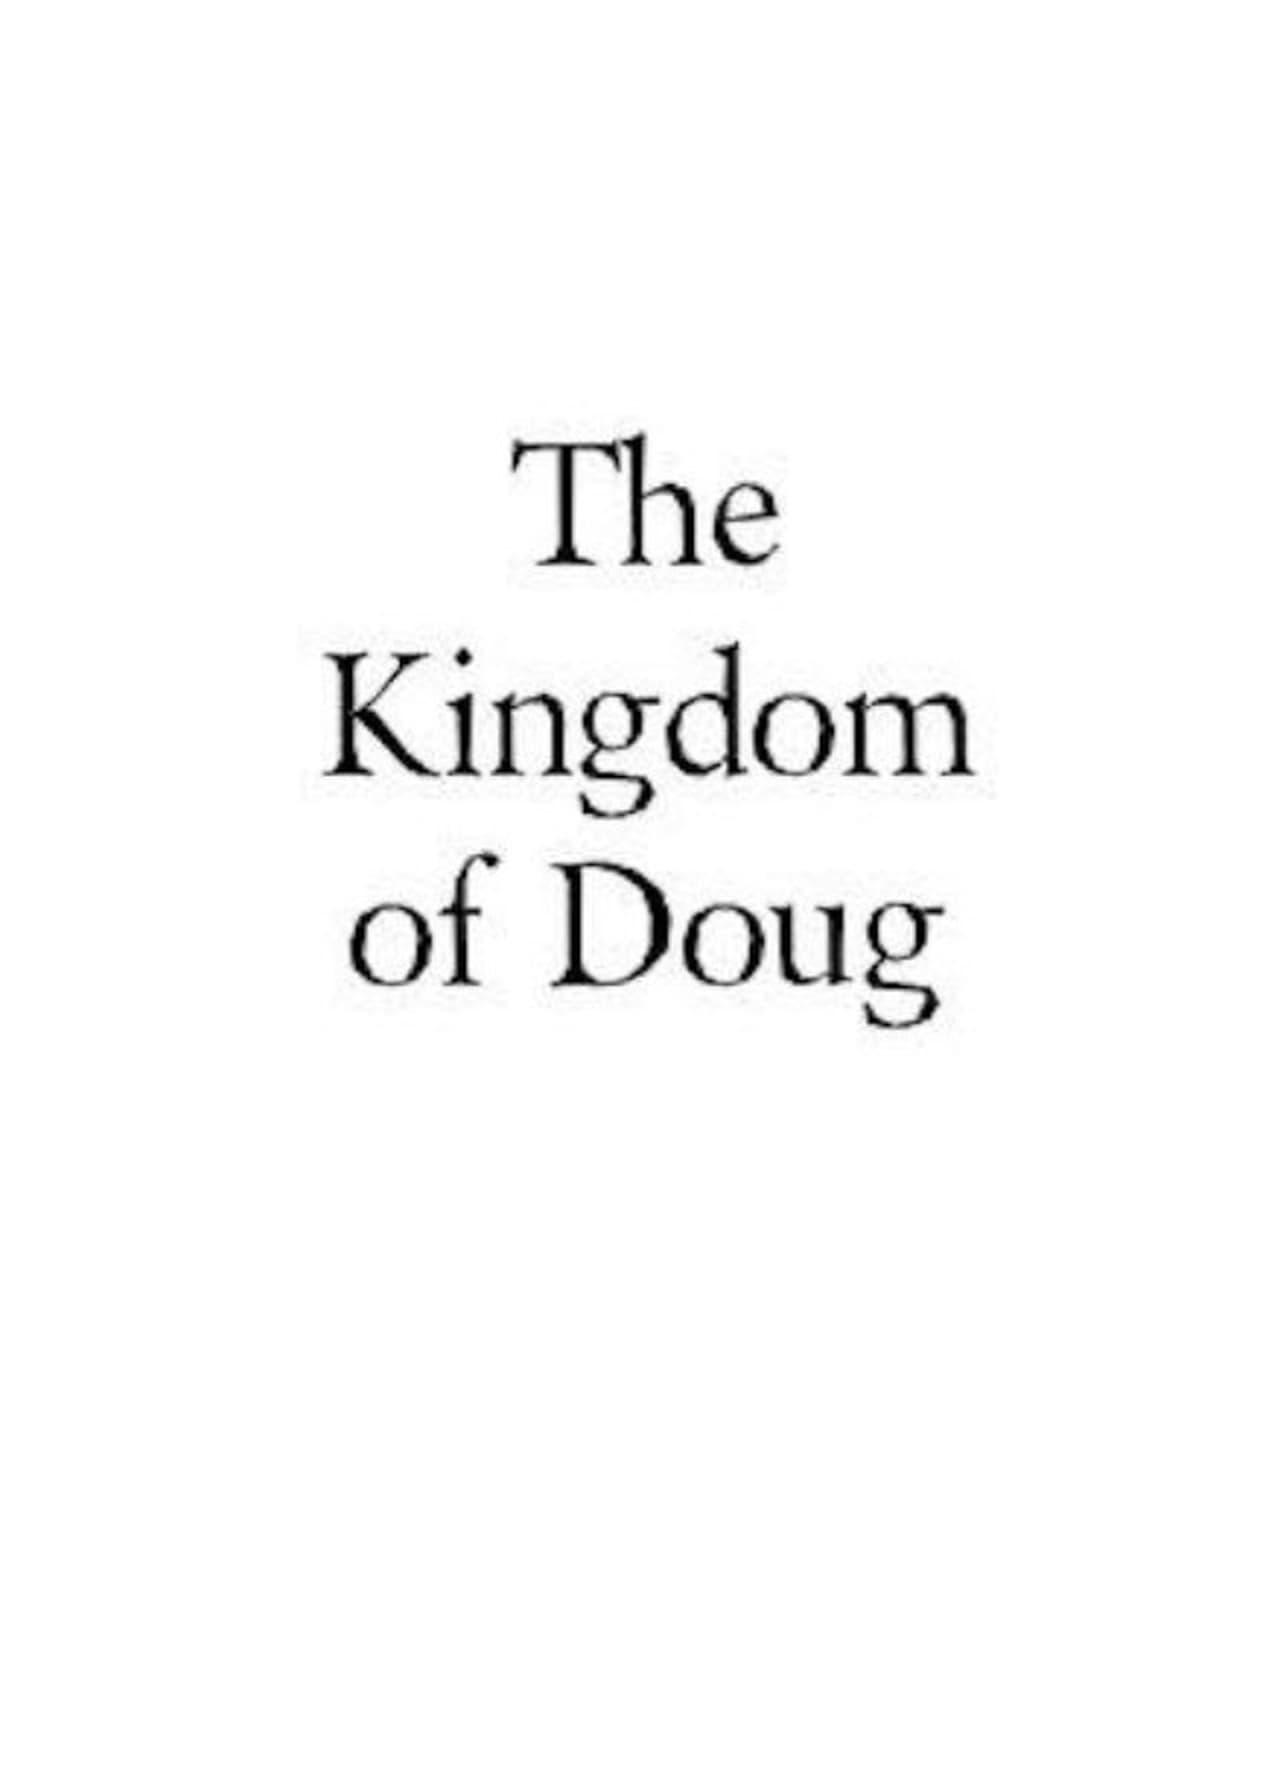 The Kingdom of Doug